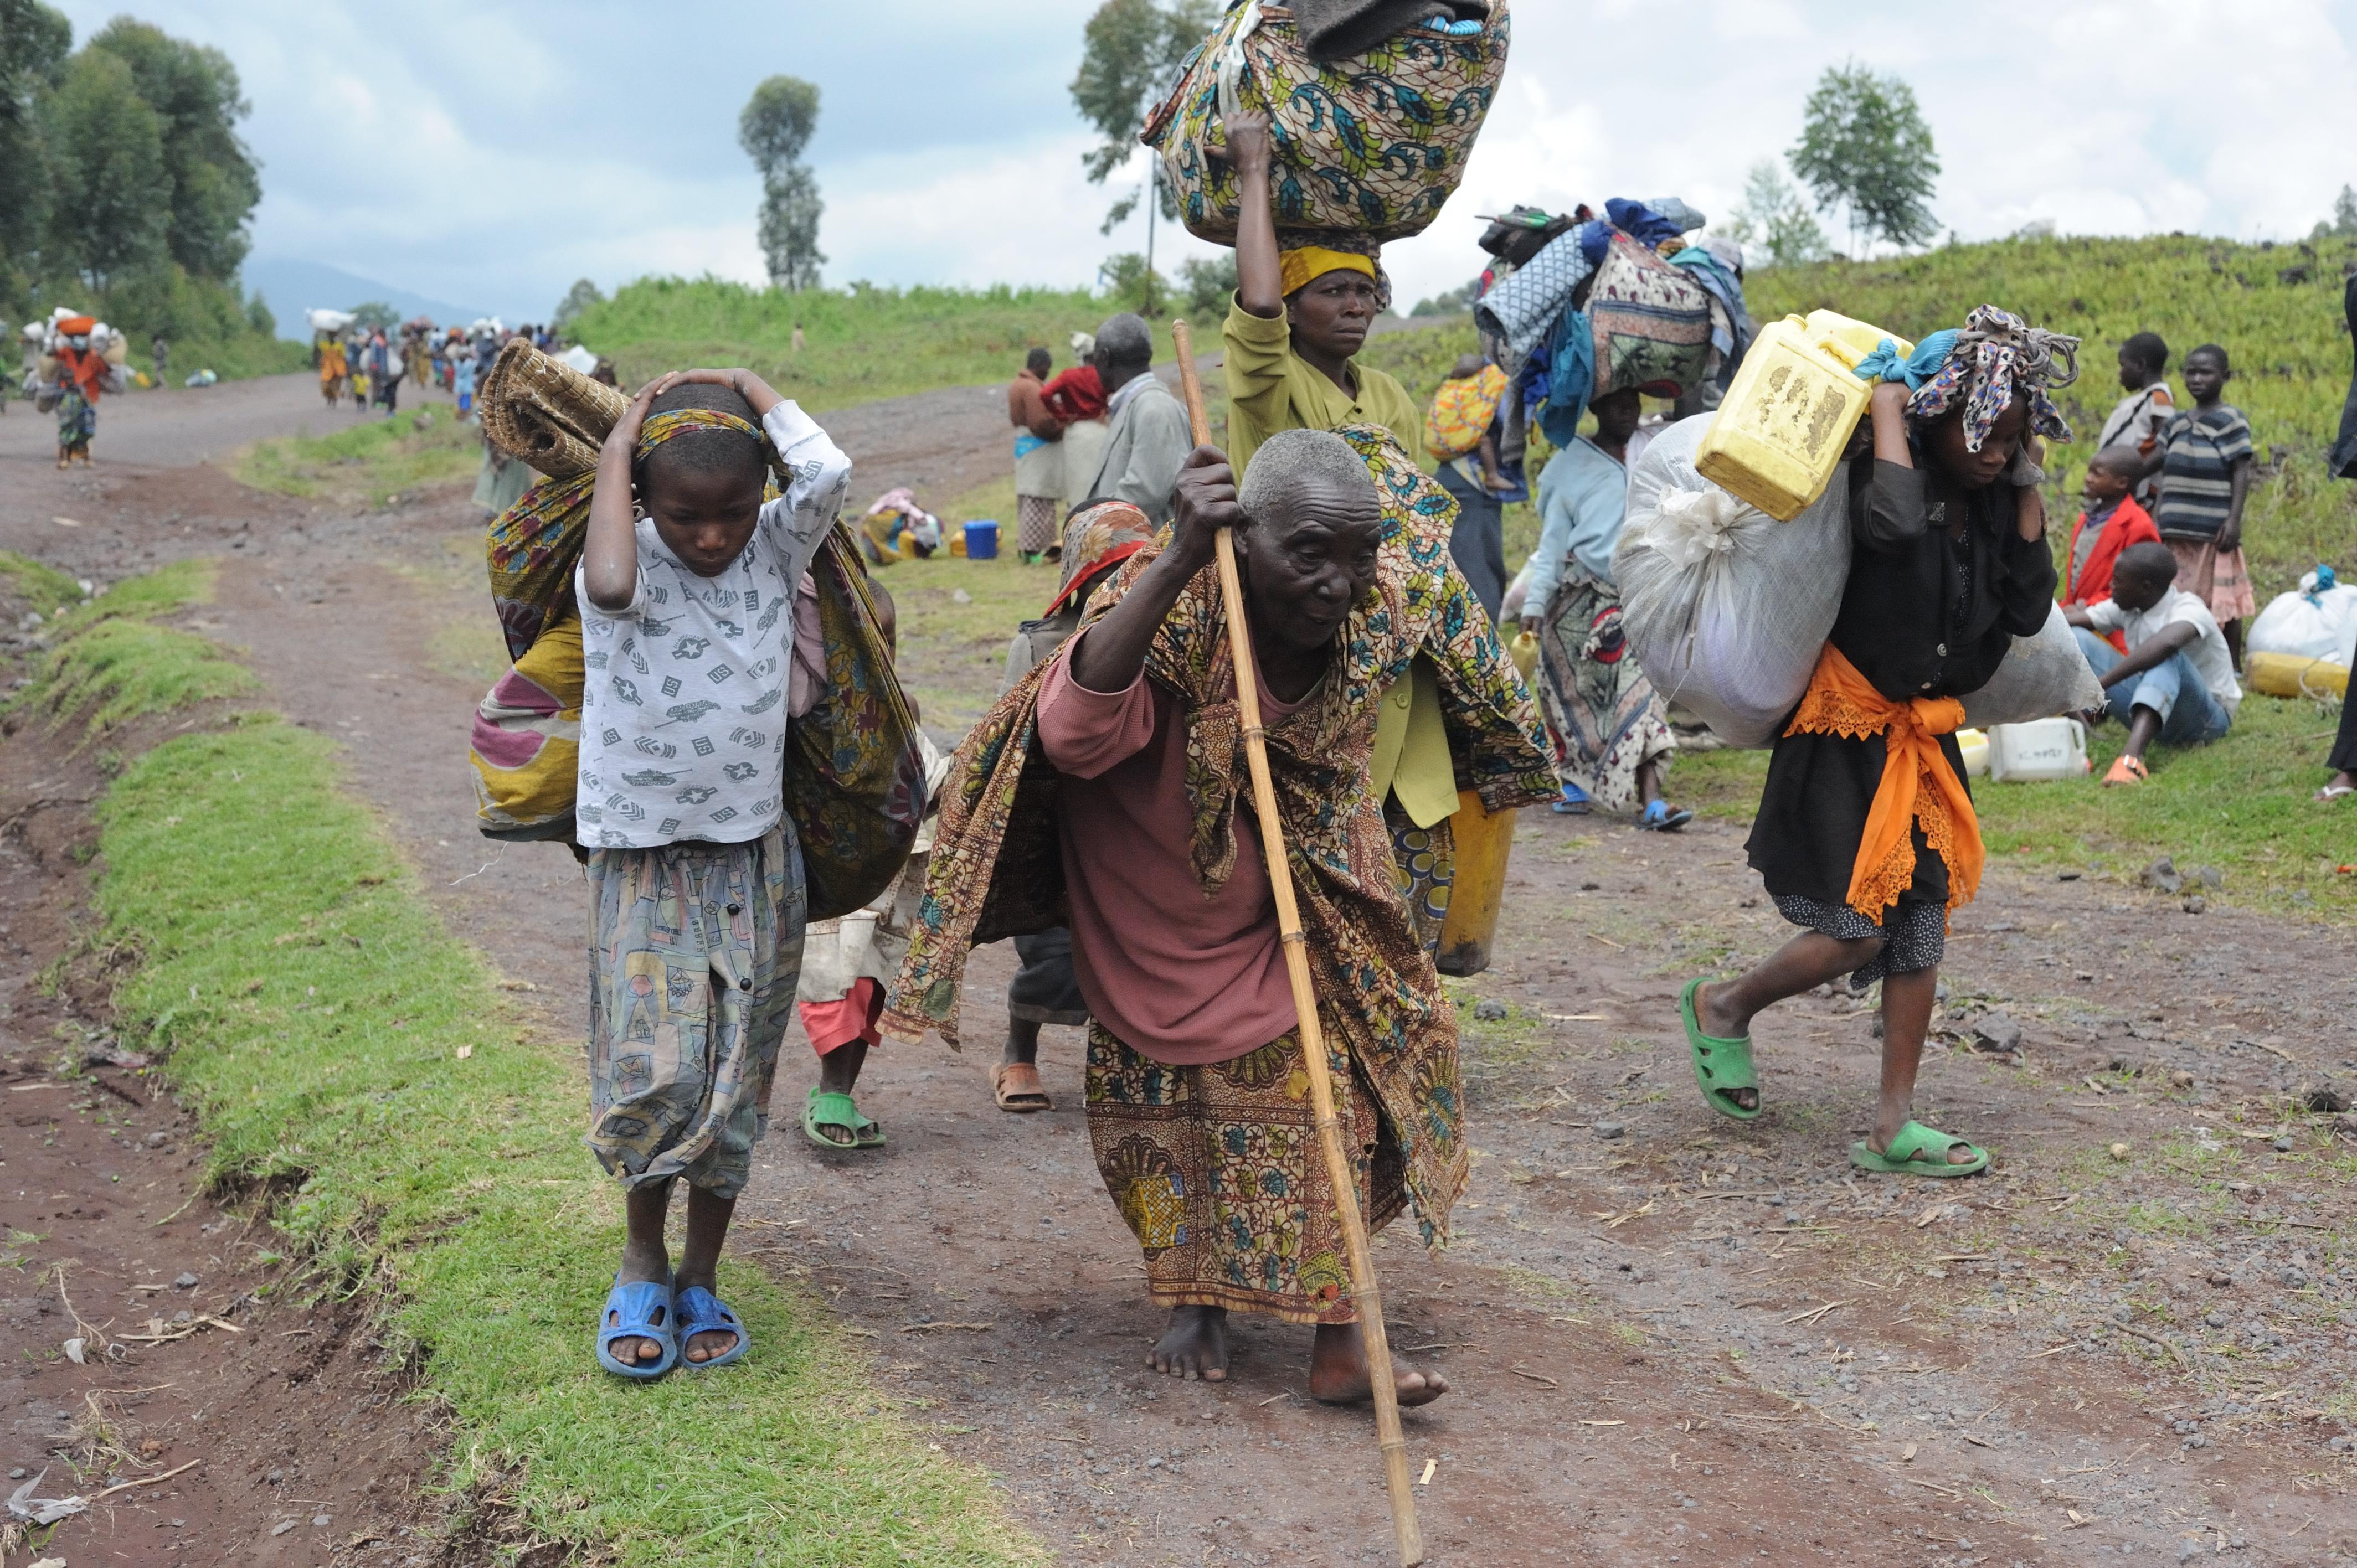 congo and rwanda relationship